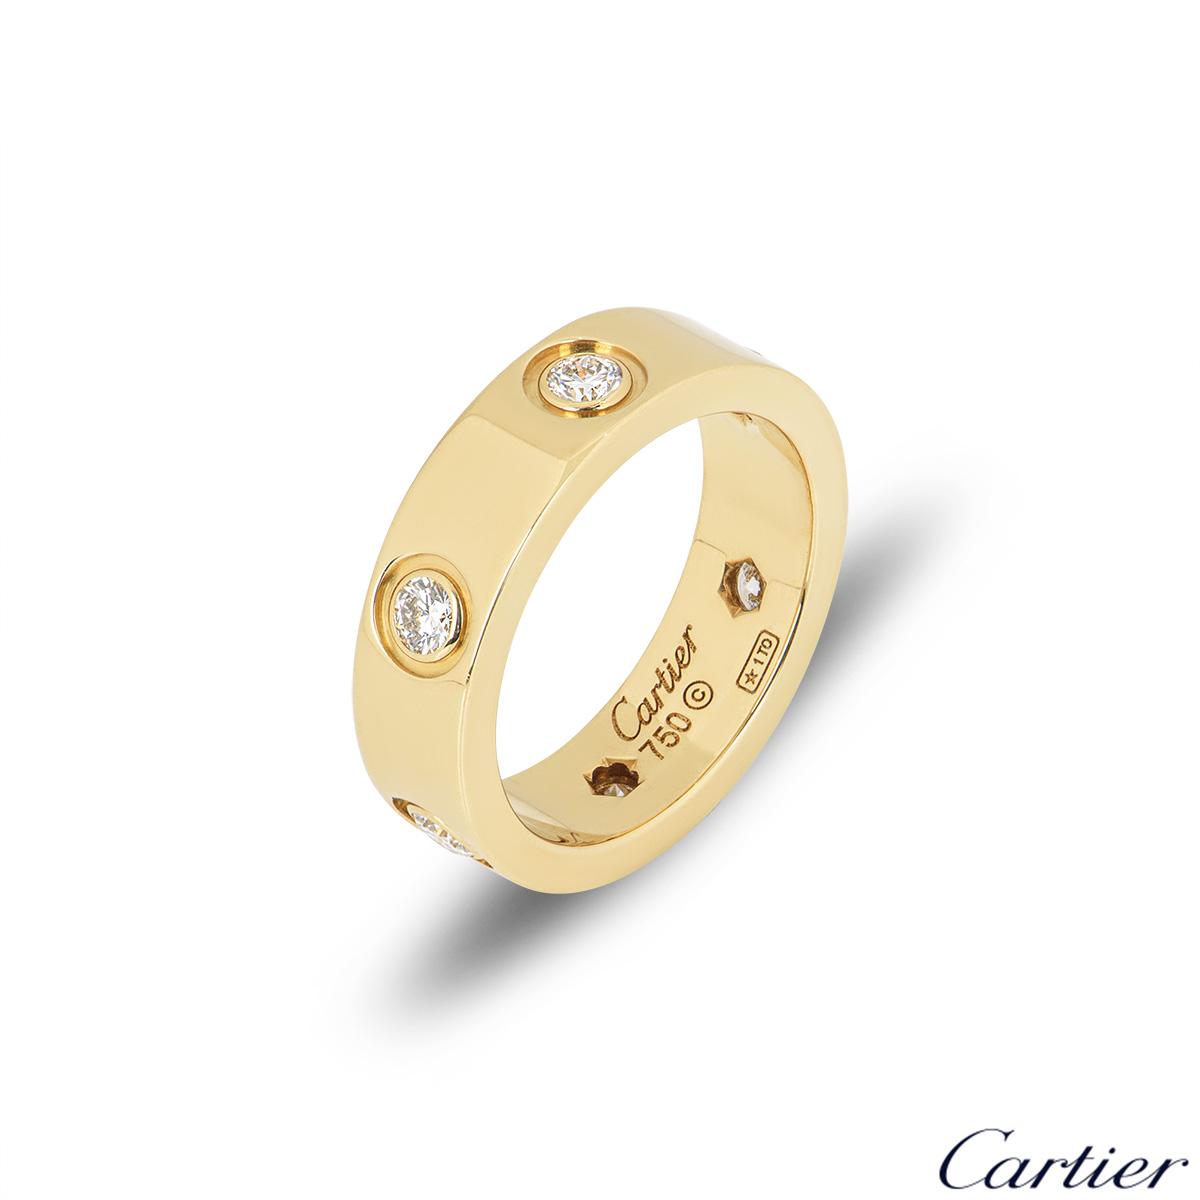 CartierYellow Gold Full Diamond Love Ring Size 52 B4025900